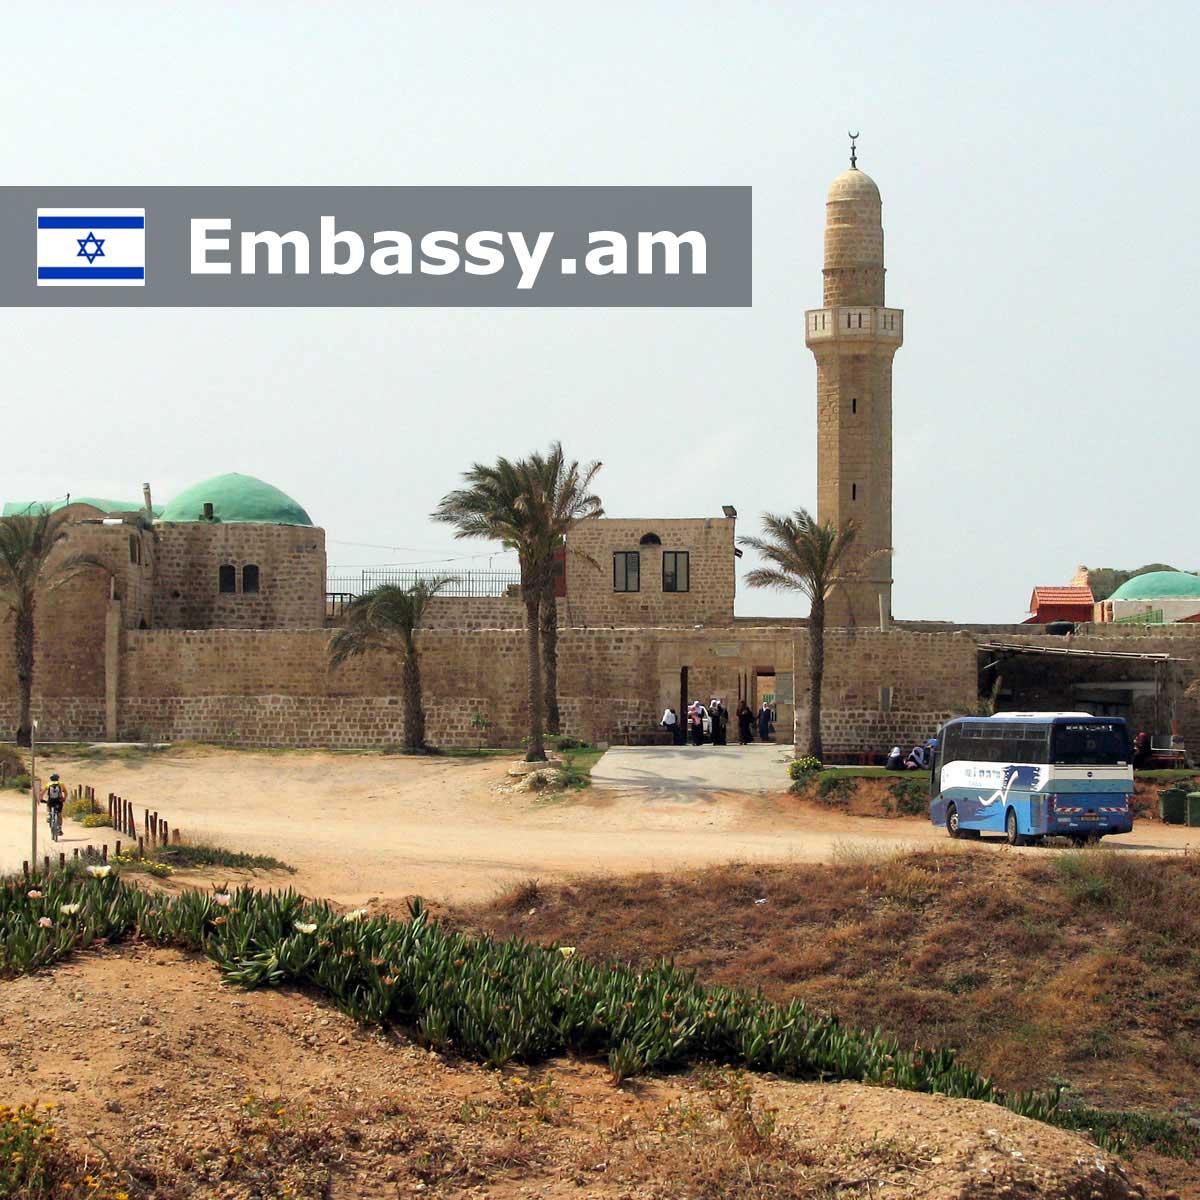 Herzliya - Hotels in Israel - Embassy.am